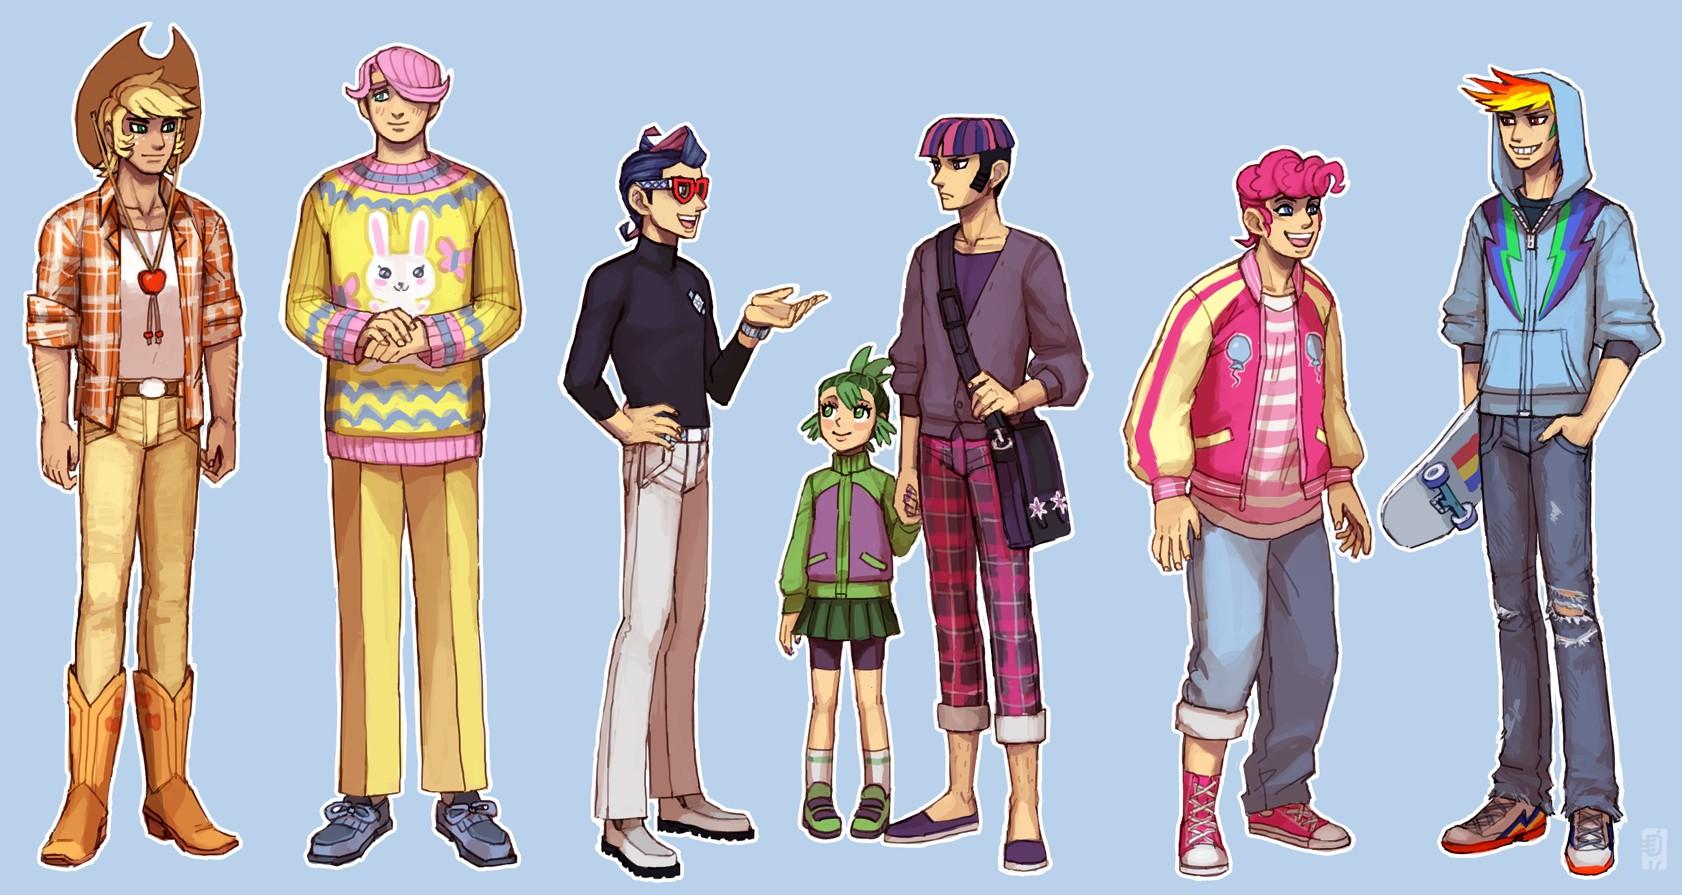 click to see this great anime 110 myspace layout anime 114 click to ... Bargeld in bwin bwin Passwort vergessen keine E-Mail bwin, wie zu spielen